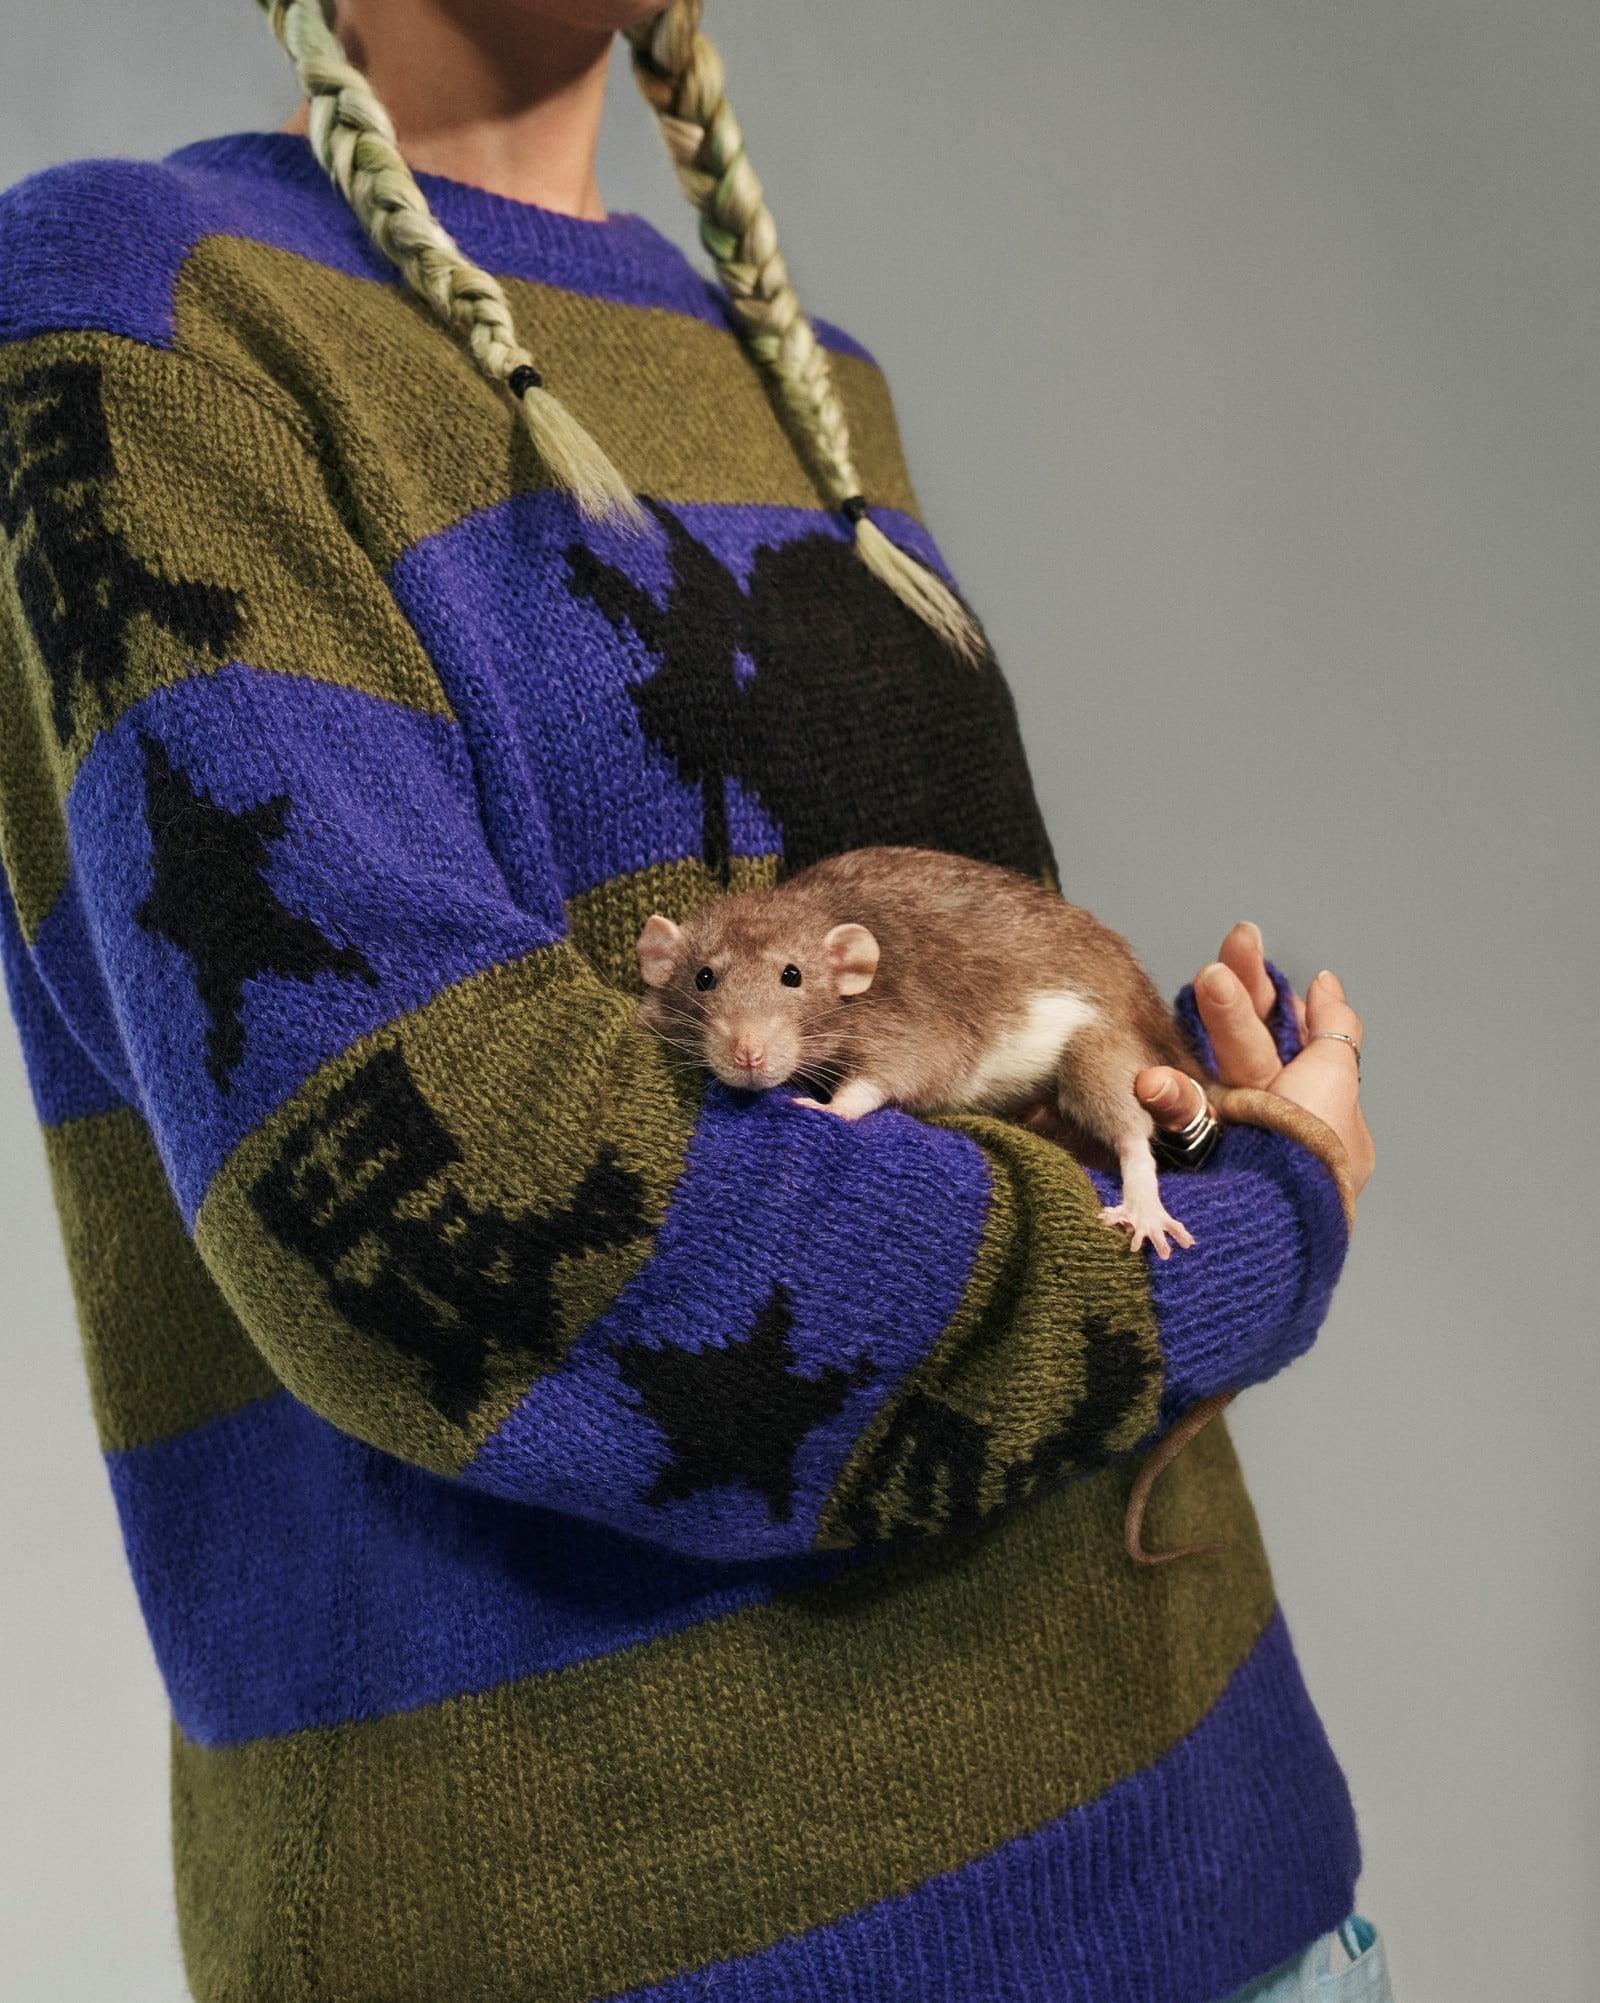 marc jacobs stray rats 2 Real Streetwear: Stray Rats 101